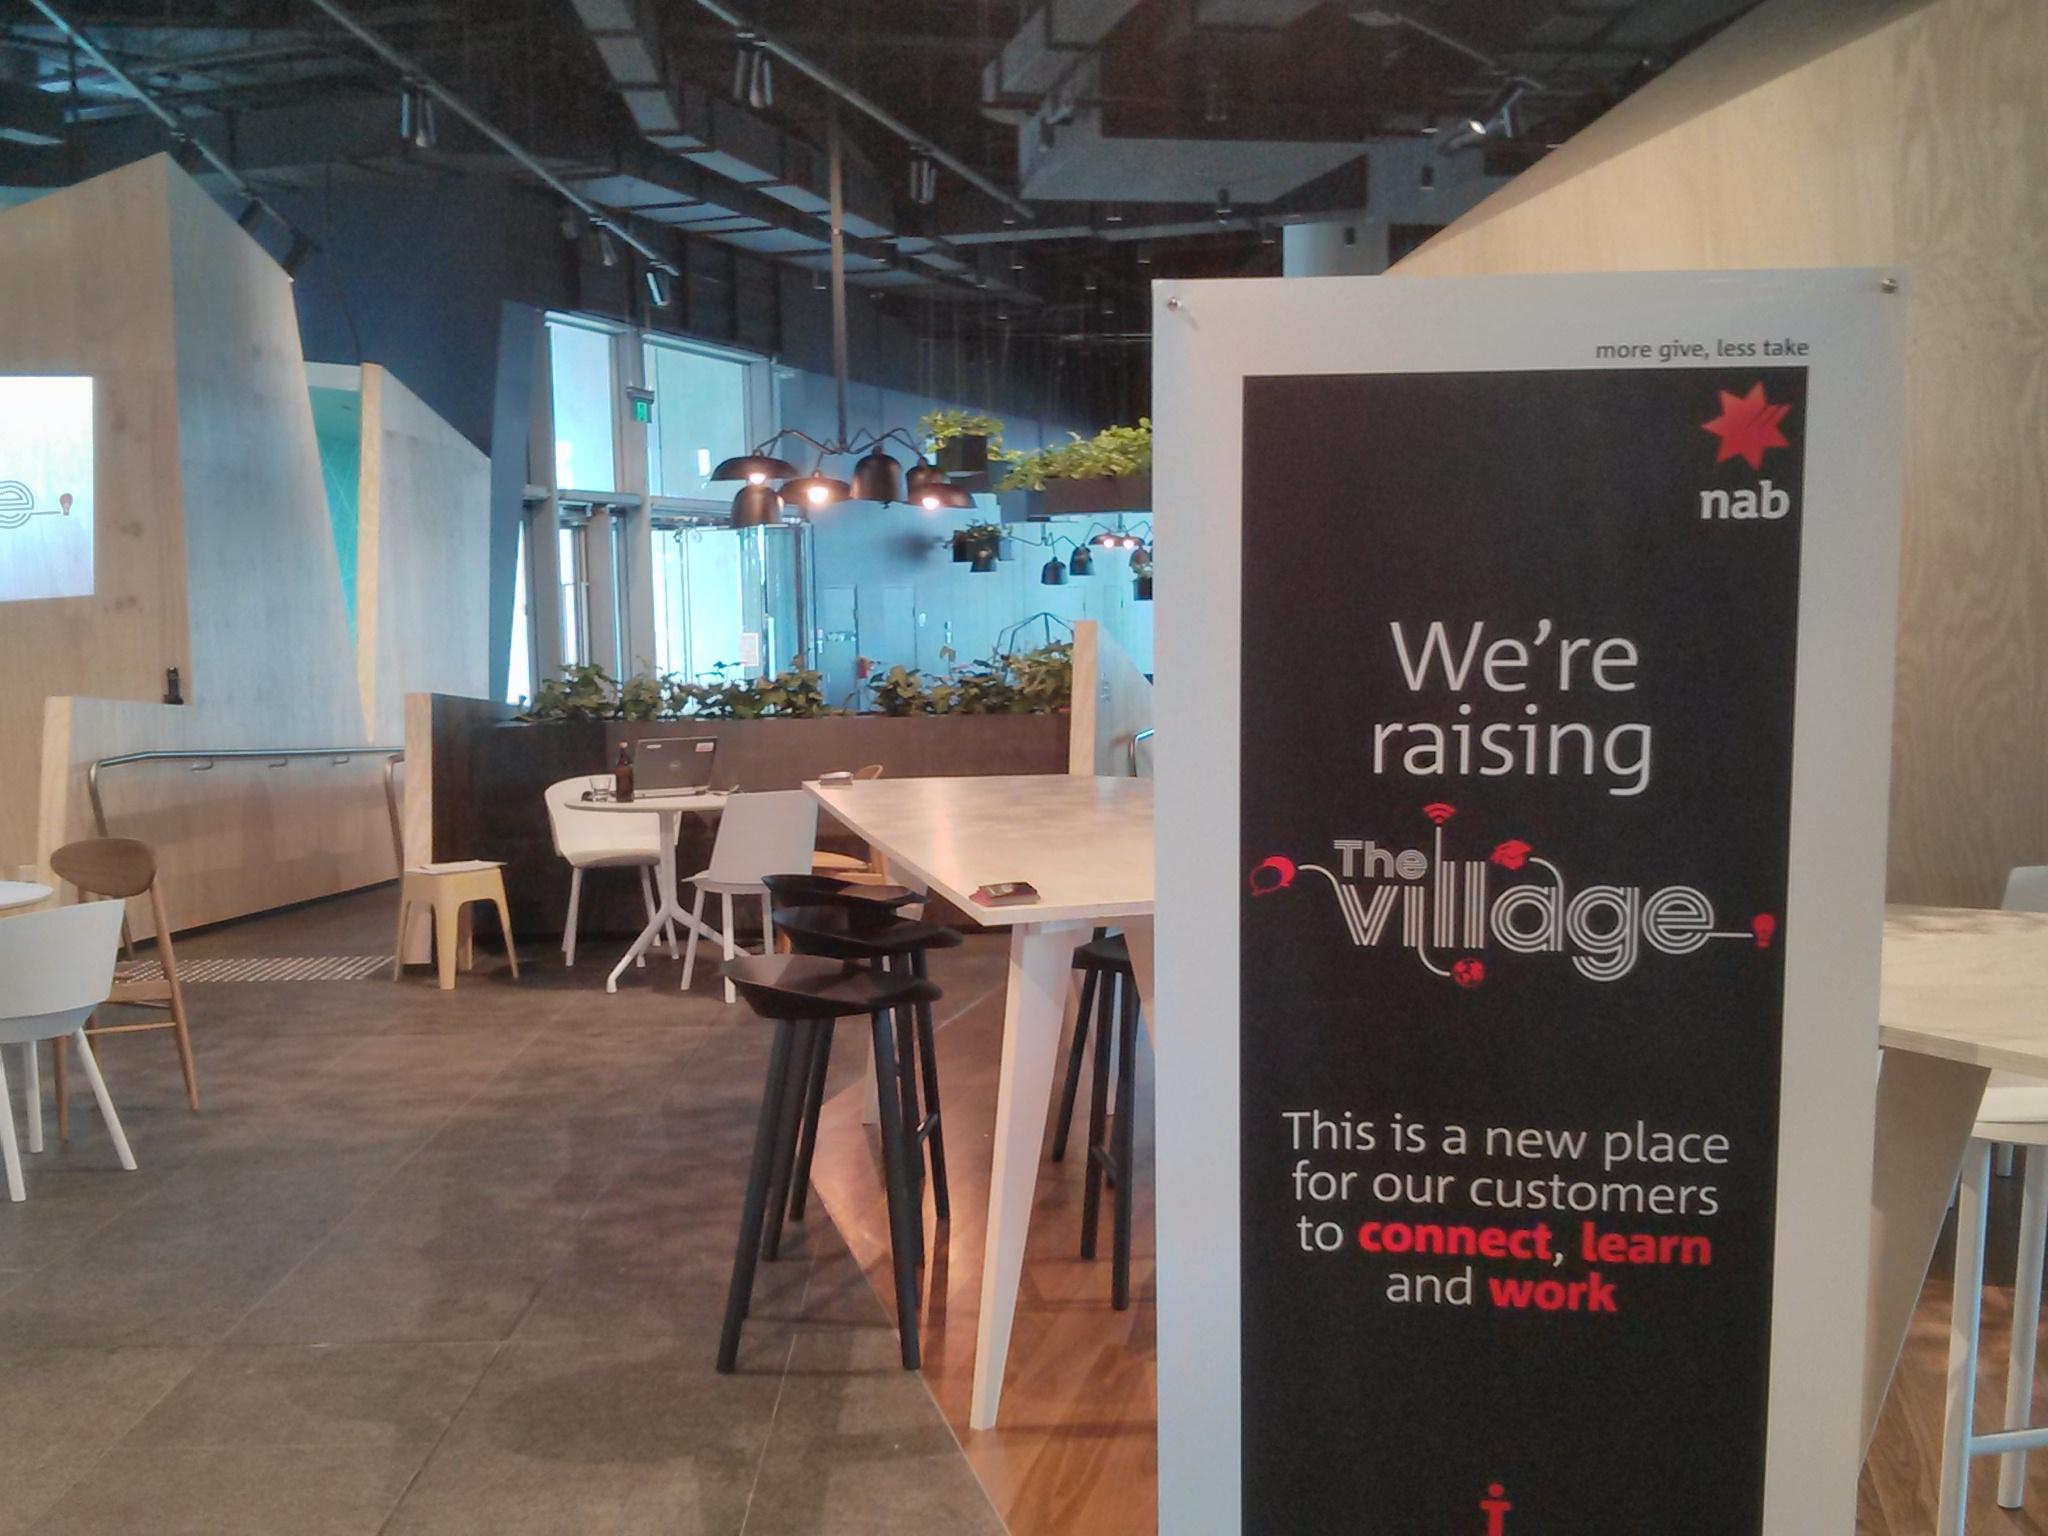 We're raising The Village